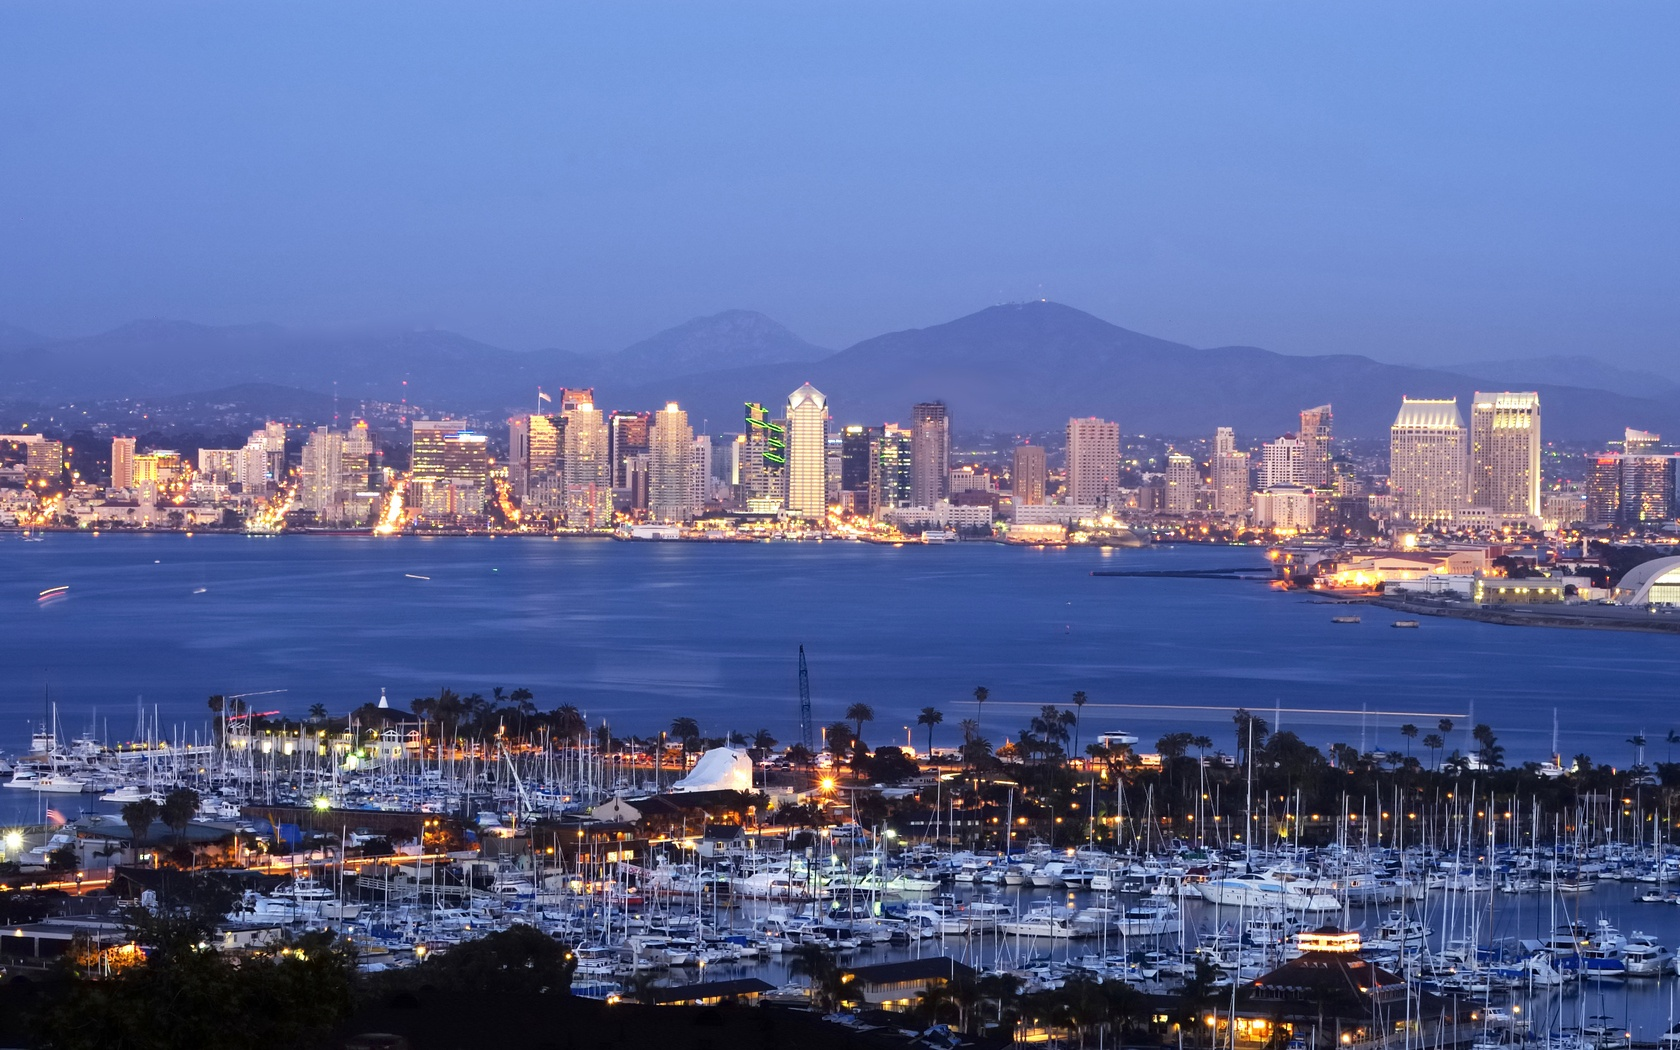 San Diego wallpaper 1680x1050